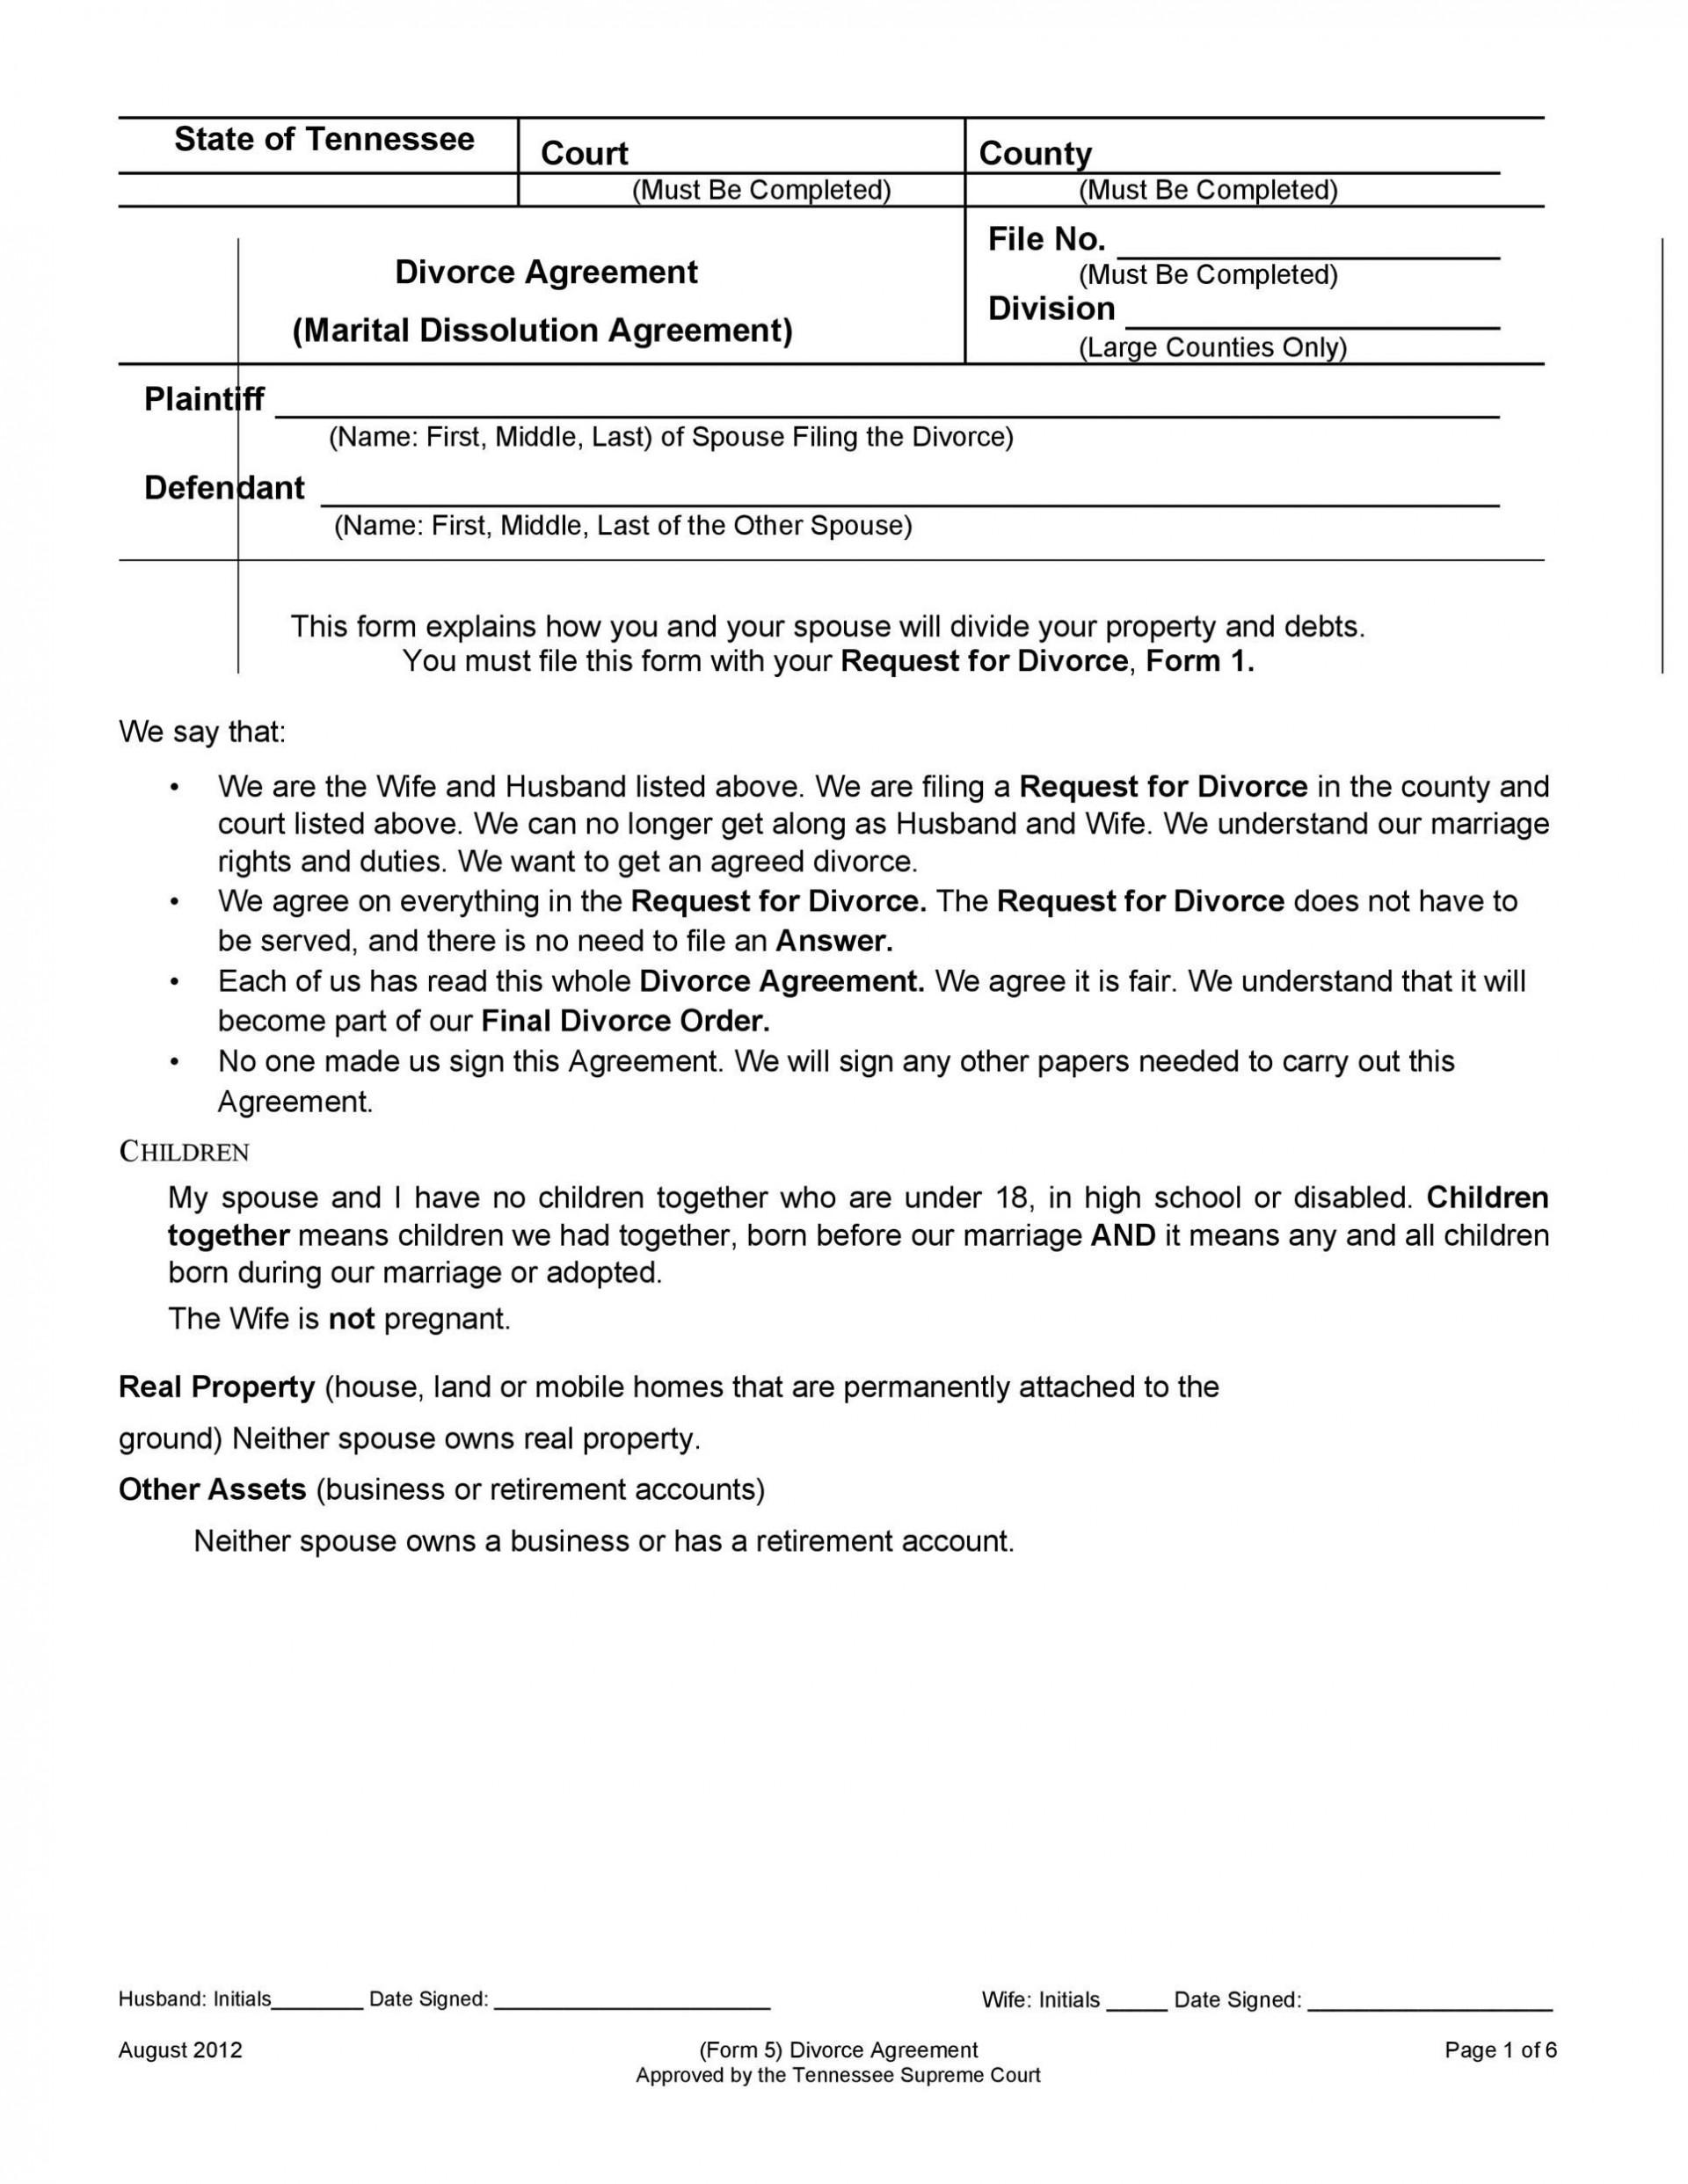 004 Dreaded Divorce Settlement Agreement Template Photo  Sample New York Marital Uk South Africa1920